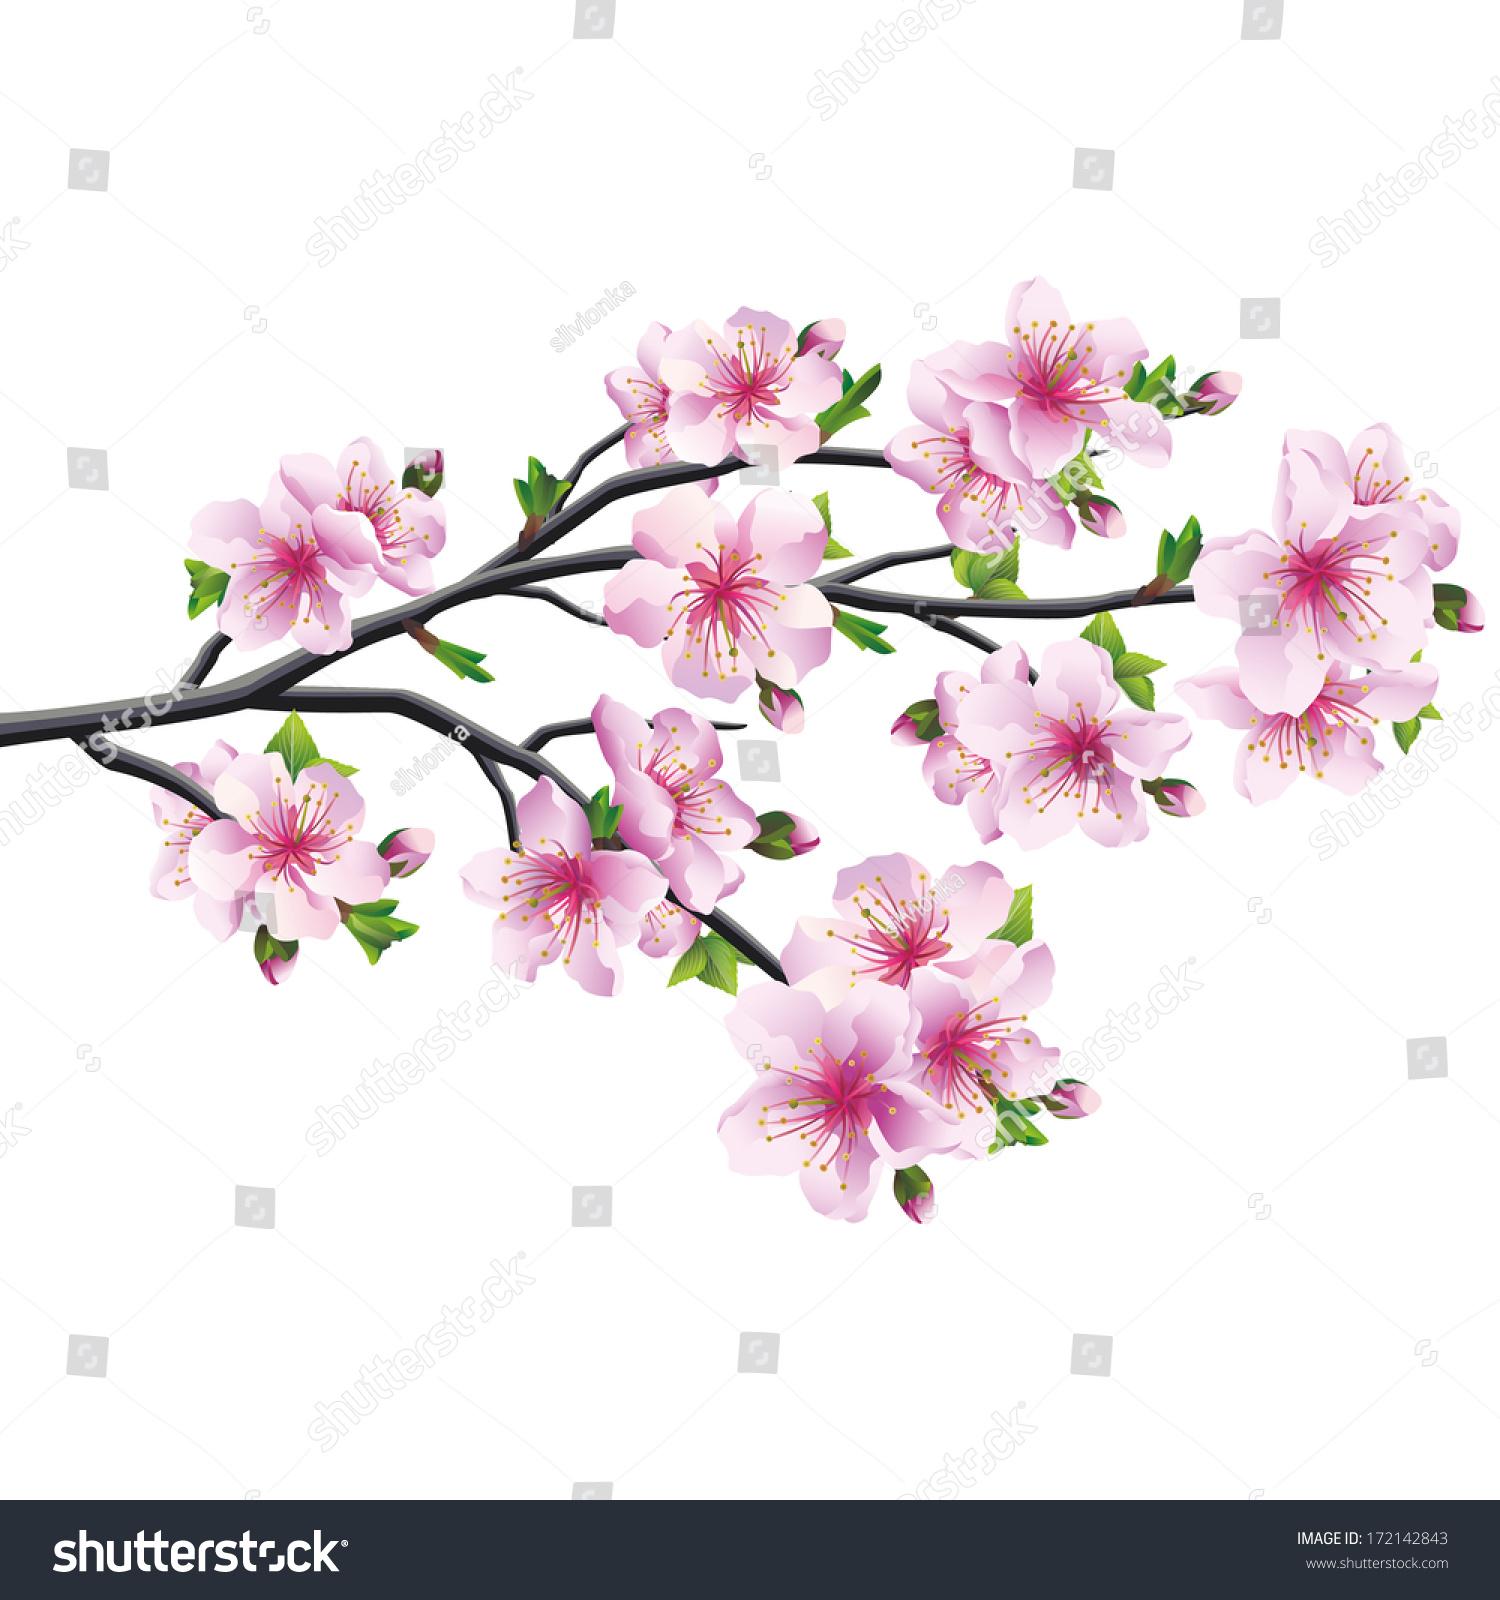 cherry blossom pink violet japanese tree stock vector. Black Bedroom Furniture Sets. Home Design Ideas